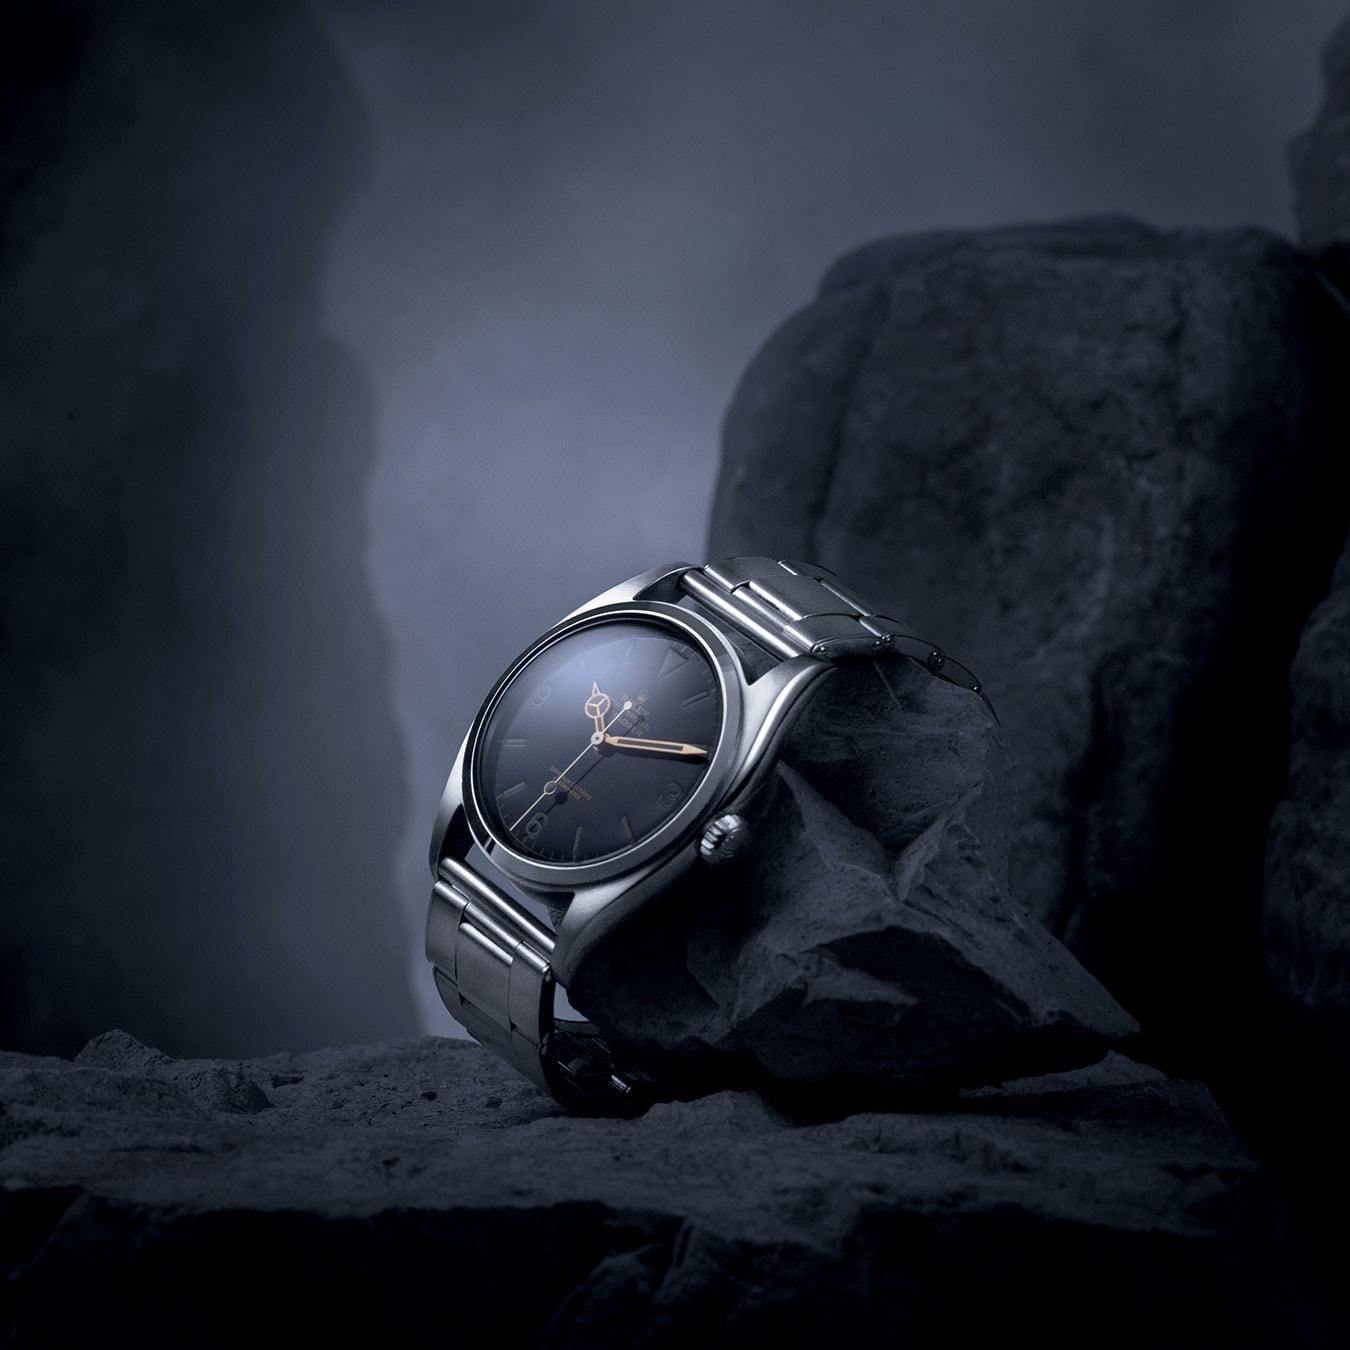 rolex Oyster Perpetual Explorer 1953